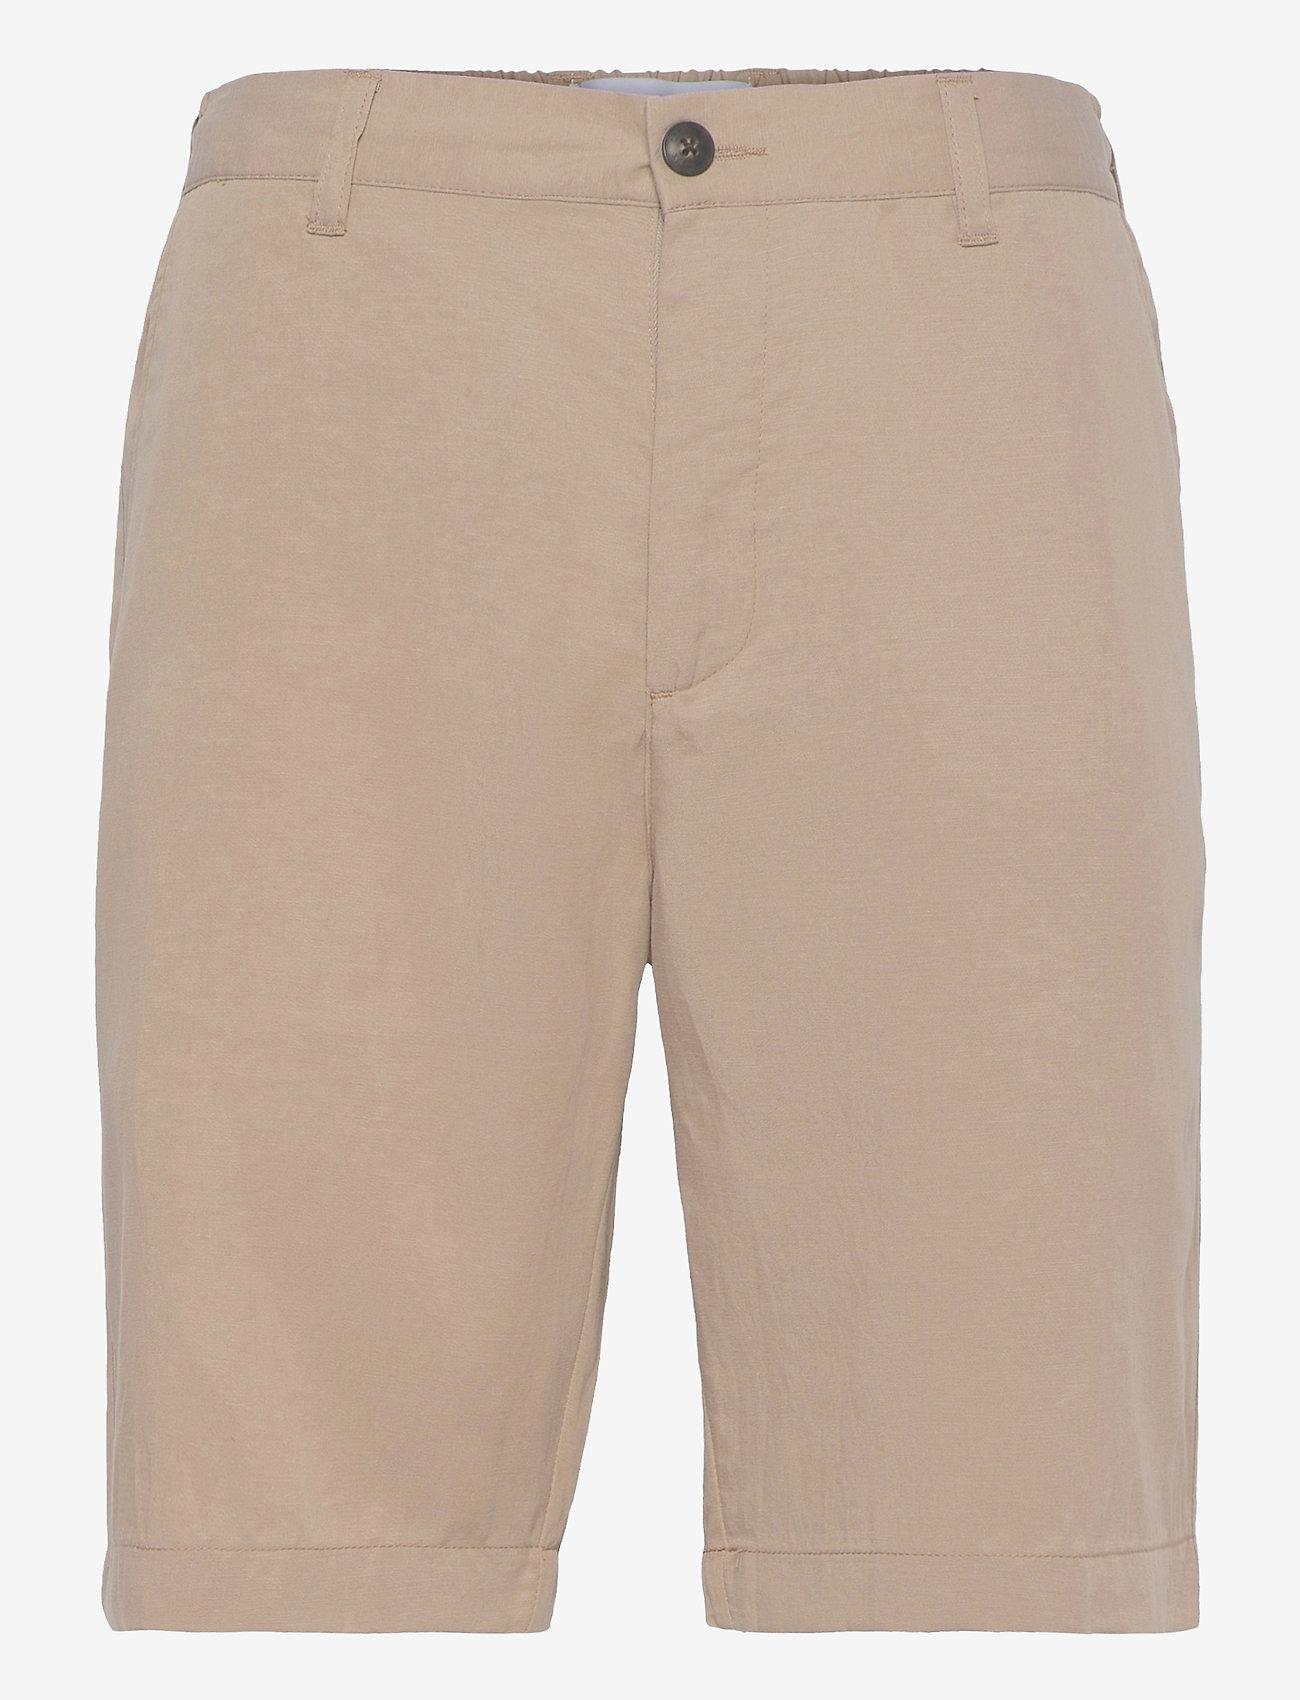 Les Deux - Pino Linen-Tencel Shorts - chino's shorts - dark sand - 0